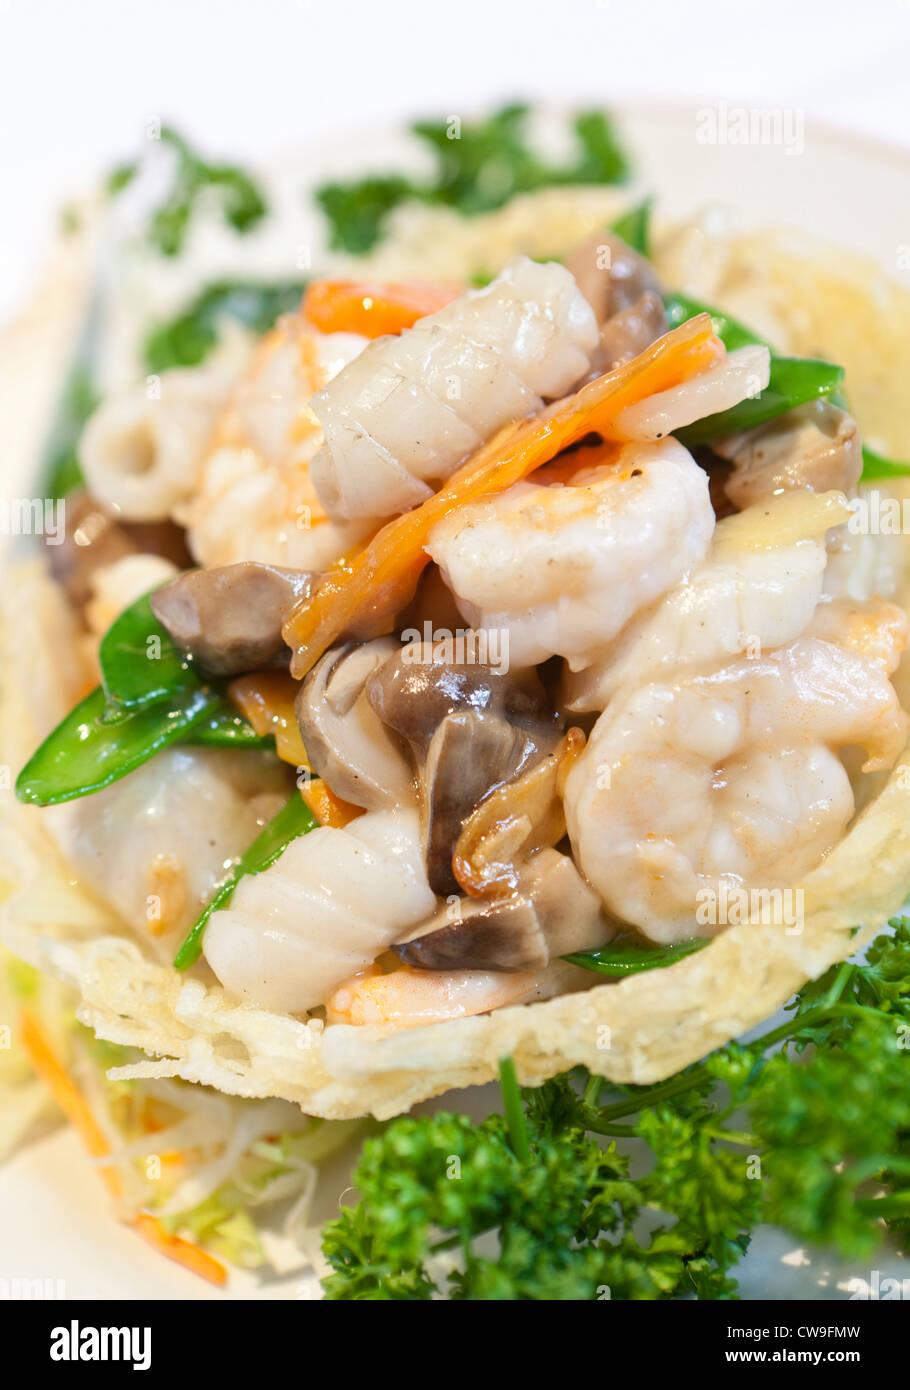 Food from Chung Ying Chinese restaurant, Chinese Quarter, Birmingham, West Midlands, England, UK - Stock Image